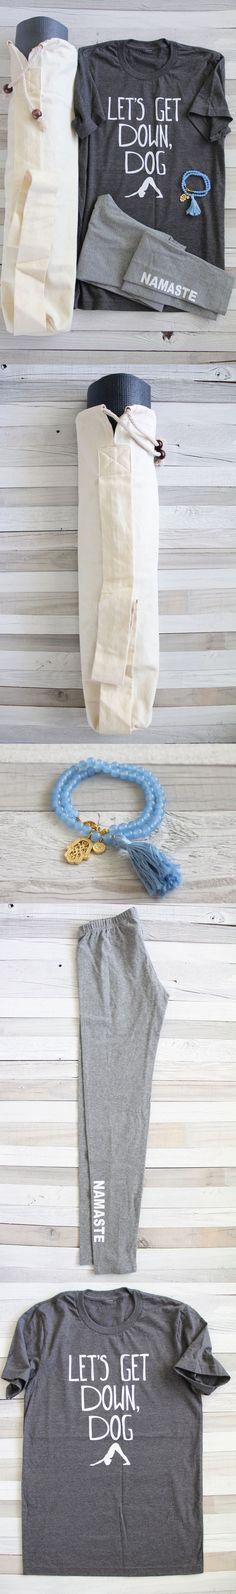 Yoga Gift Set! Includes: Yoga mat bag, yoga shirt, yoga leggings, and a yoga hamsa bracelet!